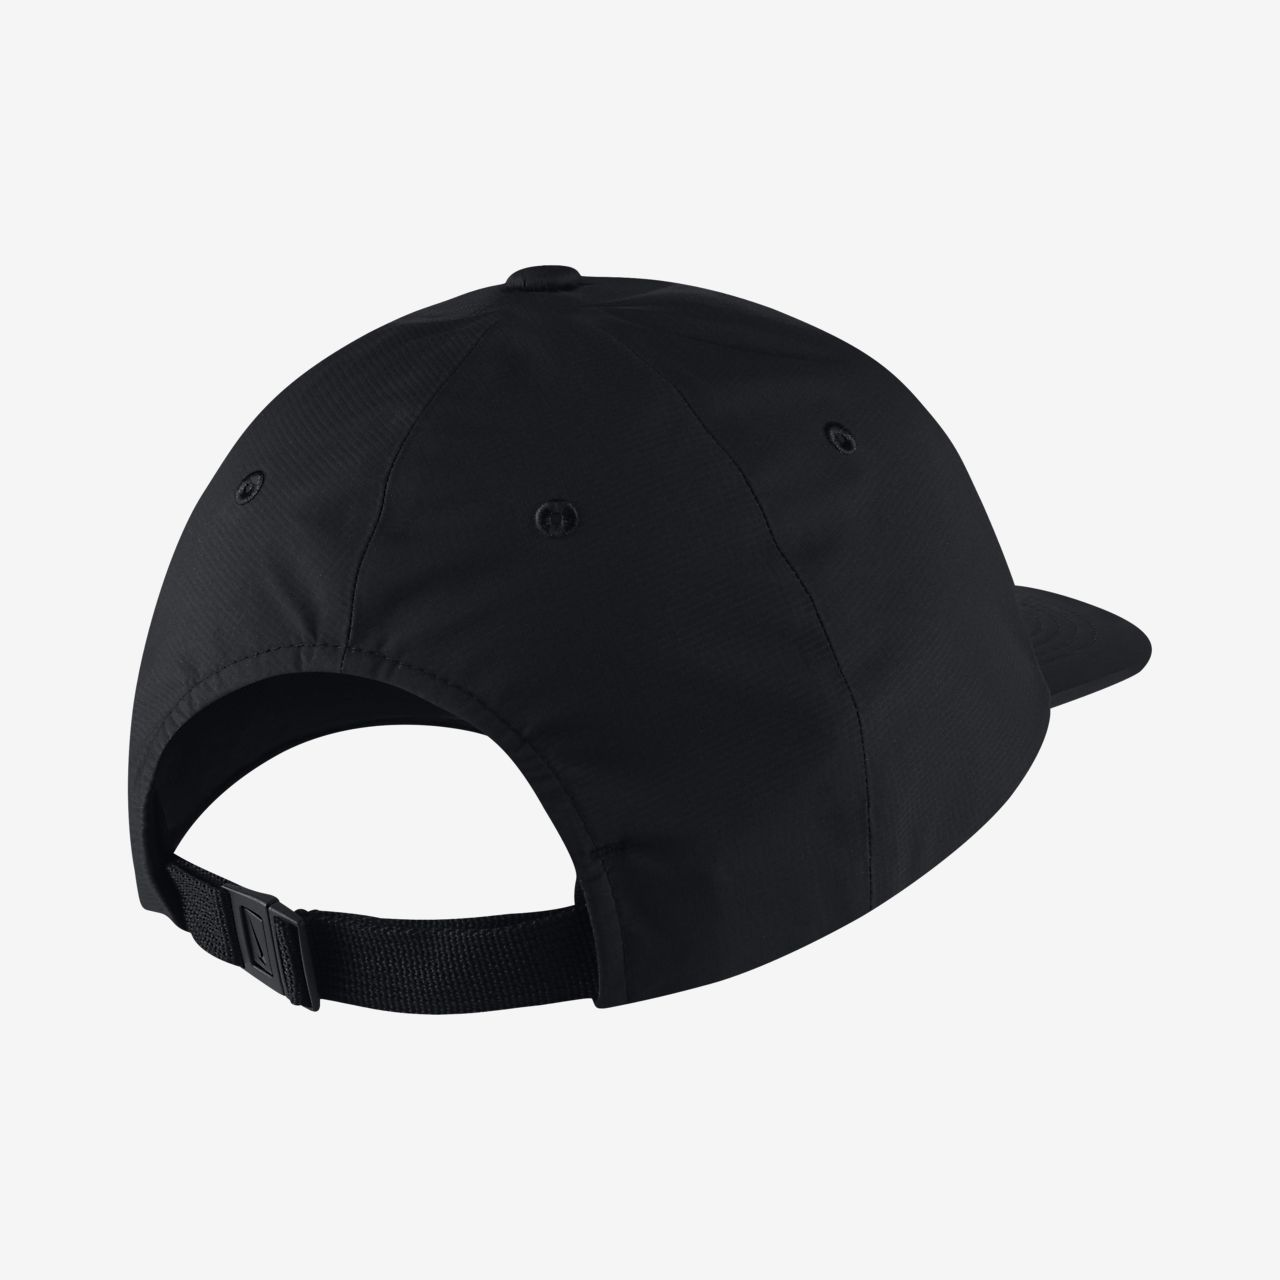 a8524d42 Nike SB H86 Adjustable Hat. Nike.com